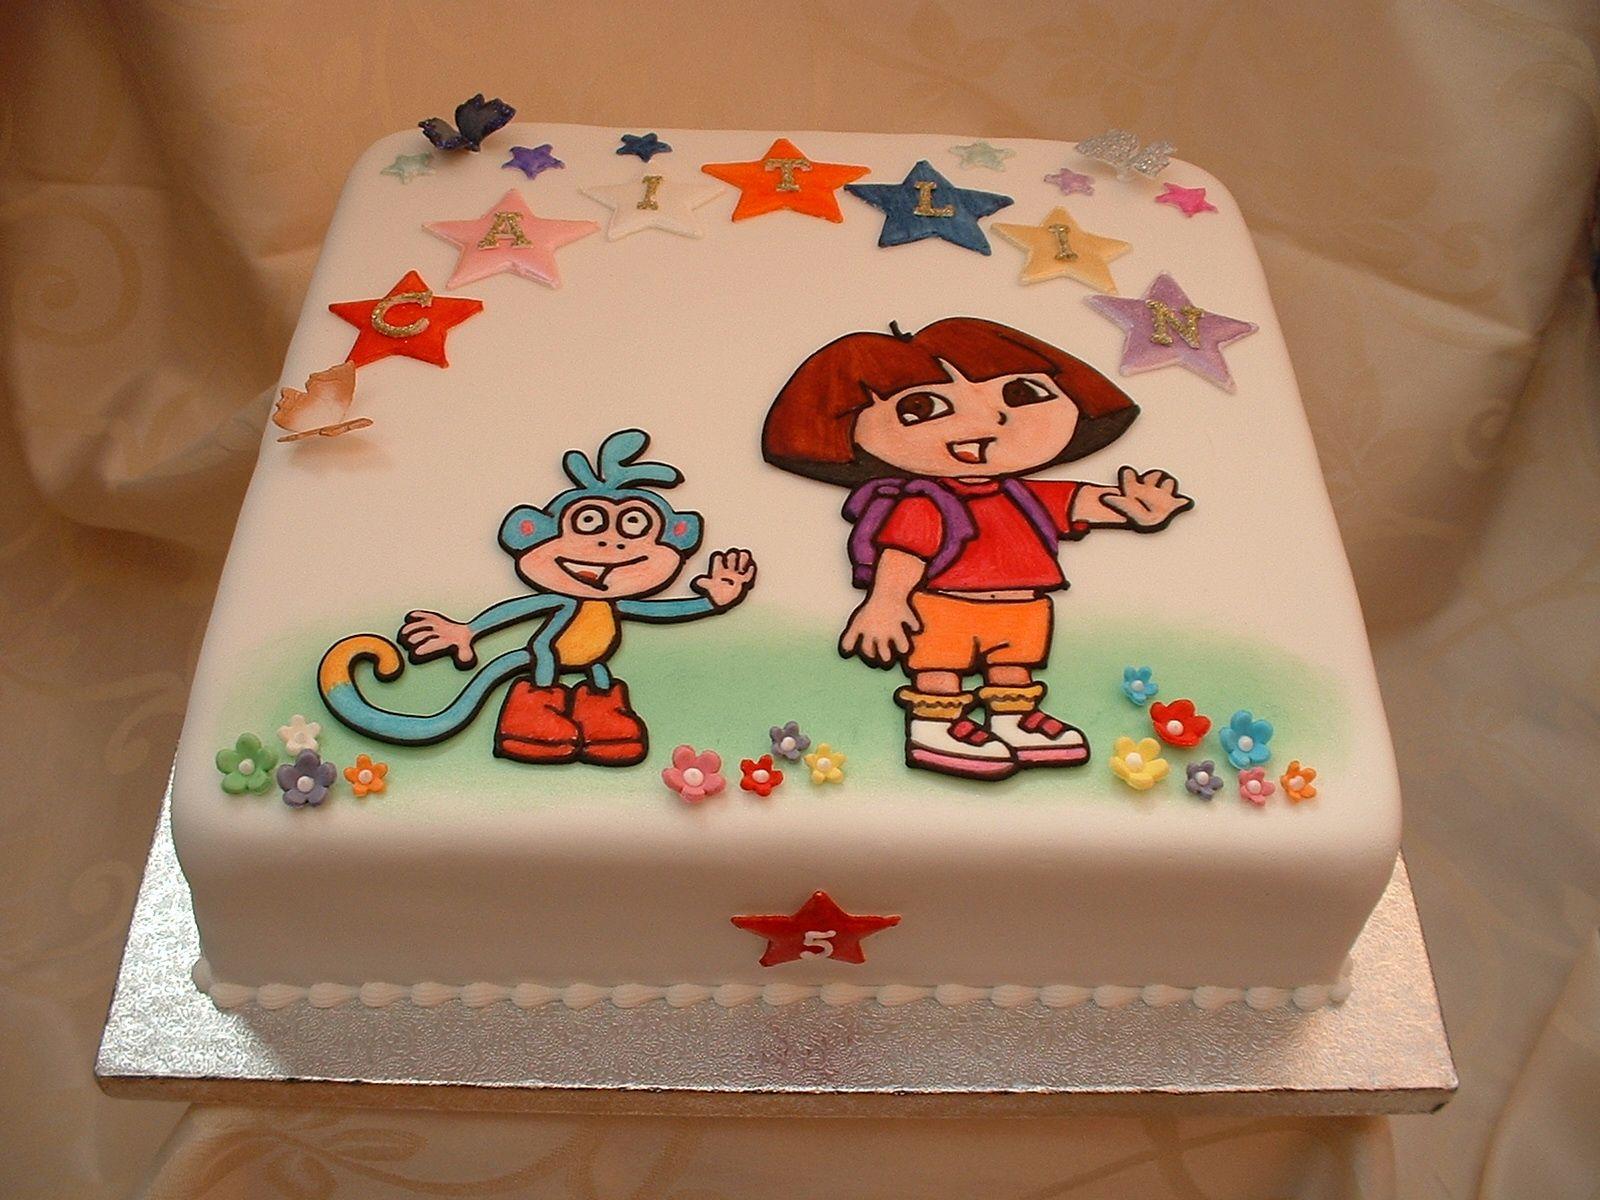 Happy Birthday Dora Cakes Dora The Explorer Birthday Cake cakes